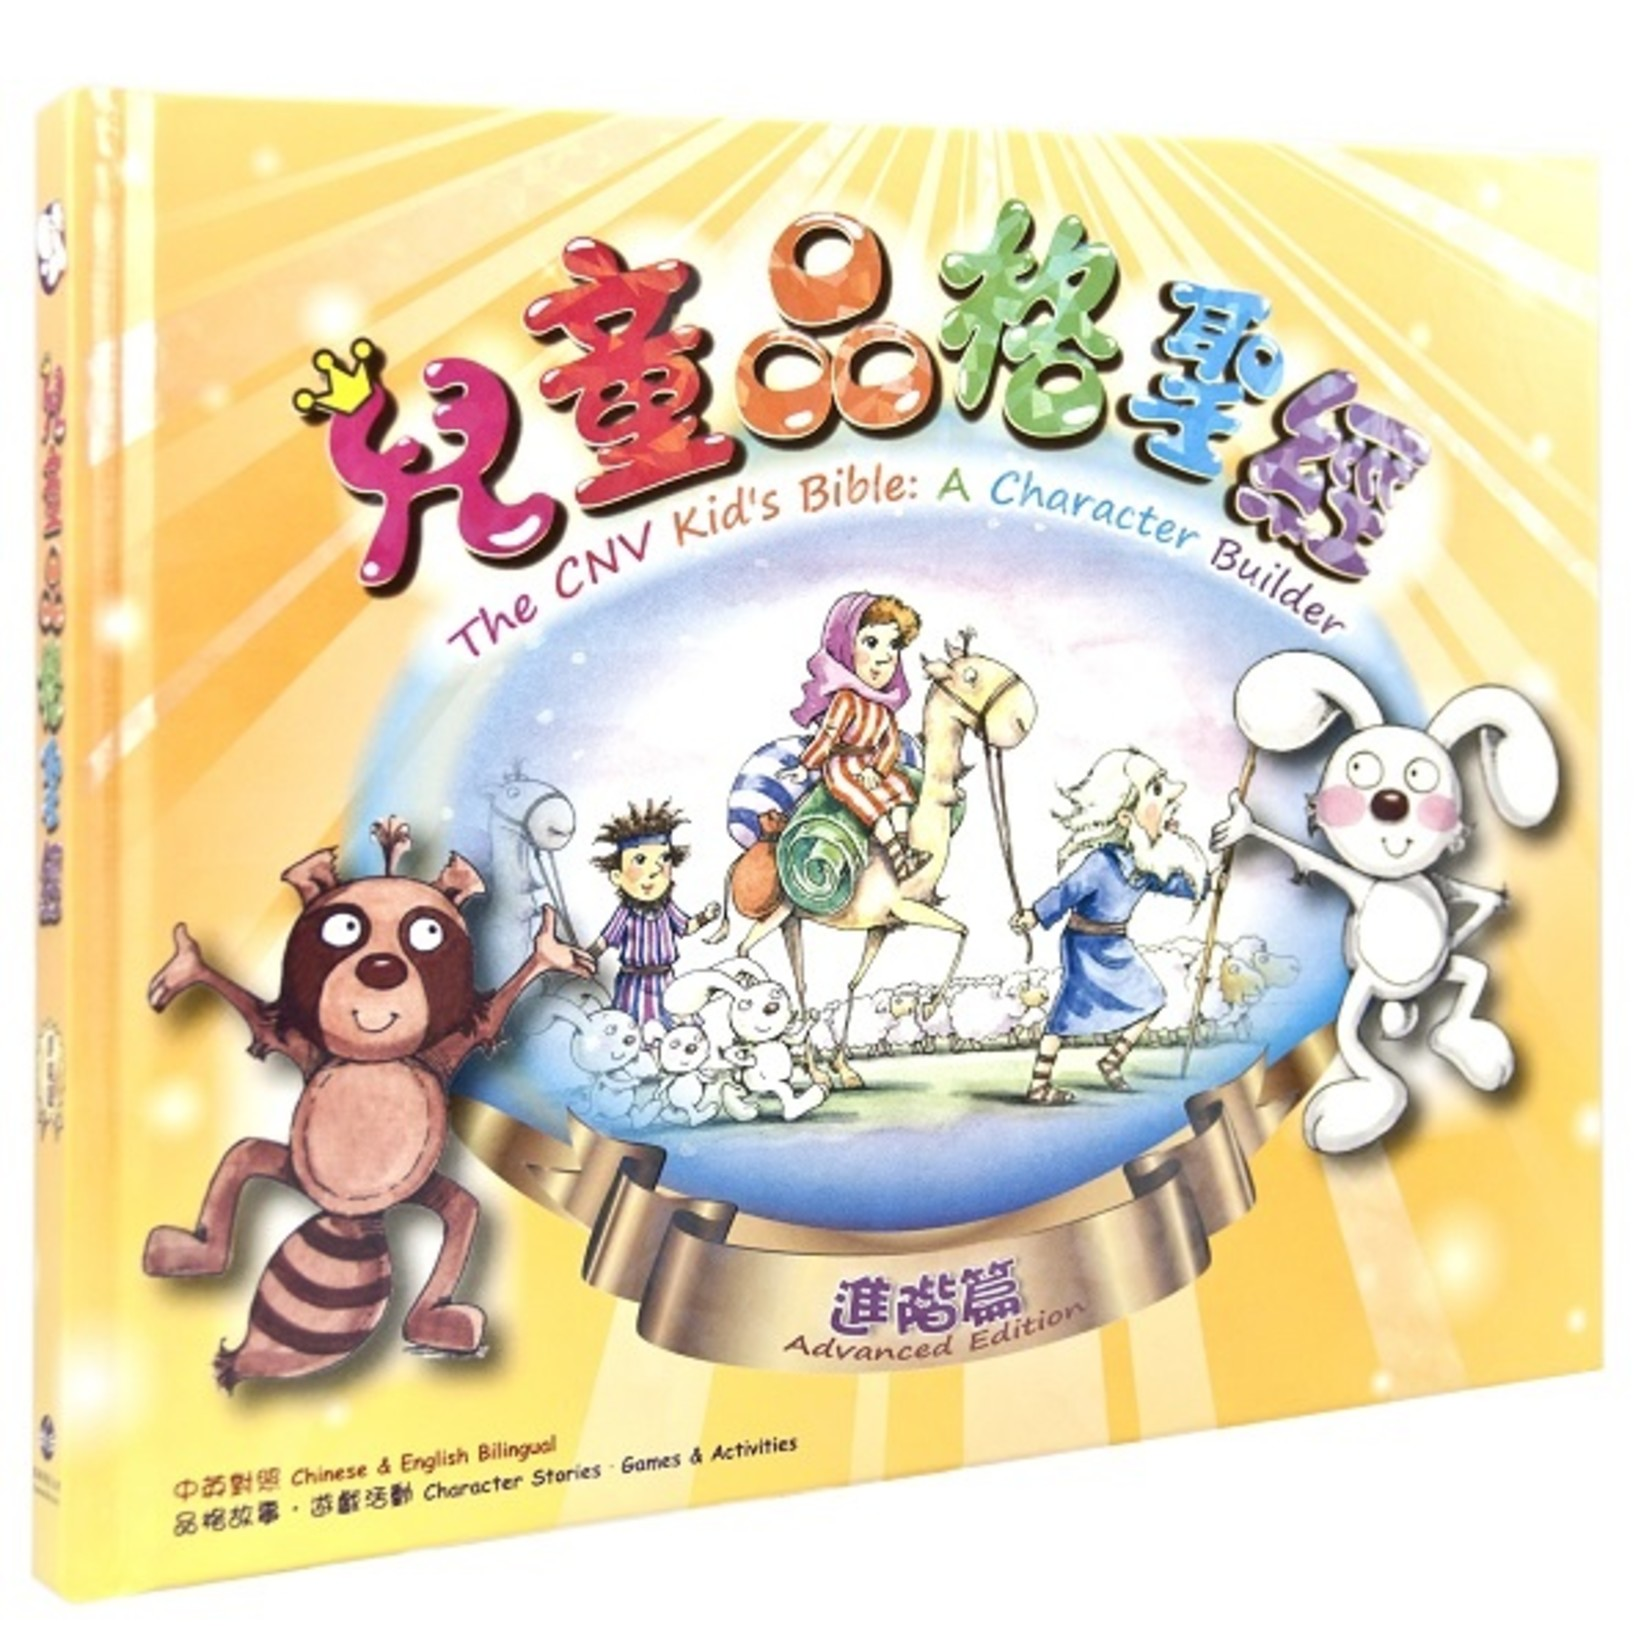 環球聖經公會 The Worldwide Bible Society 兒童品格聖經(進階篇)(中英對照)(繁體) The CNV Kid's Bible: A Character Builder (Advanced Edition, Traditional Version)